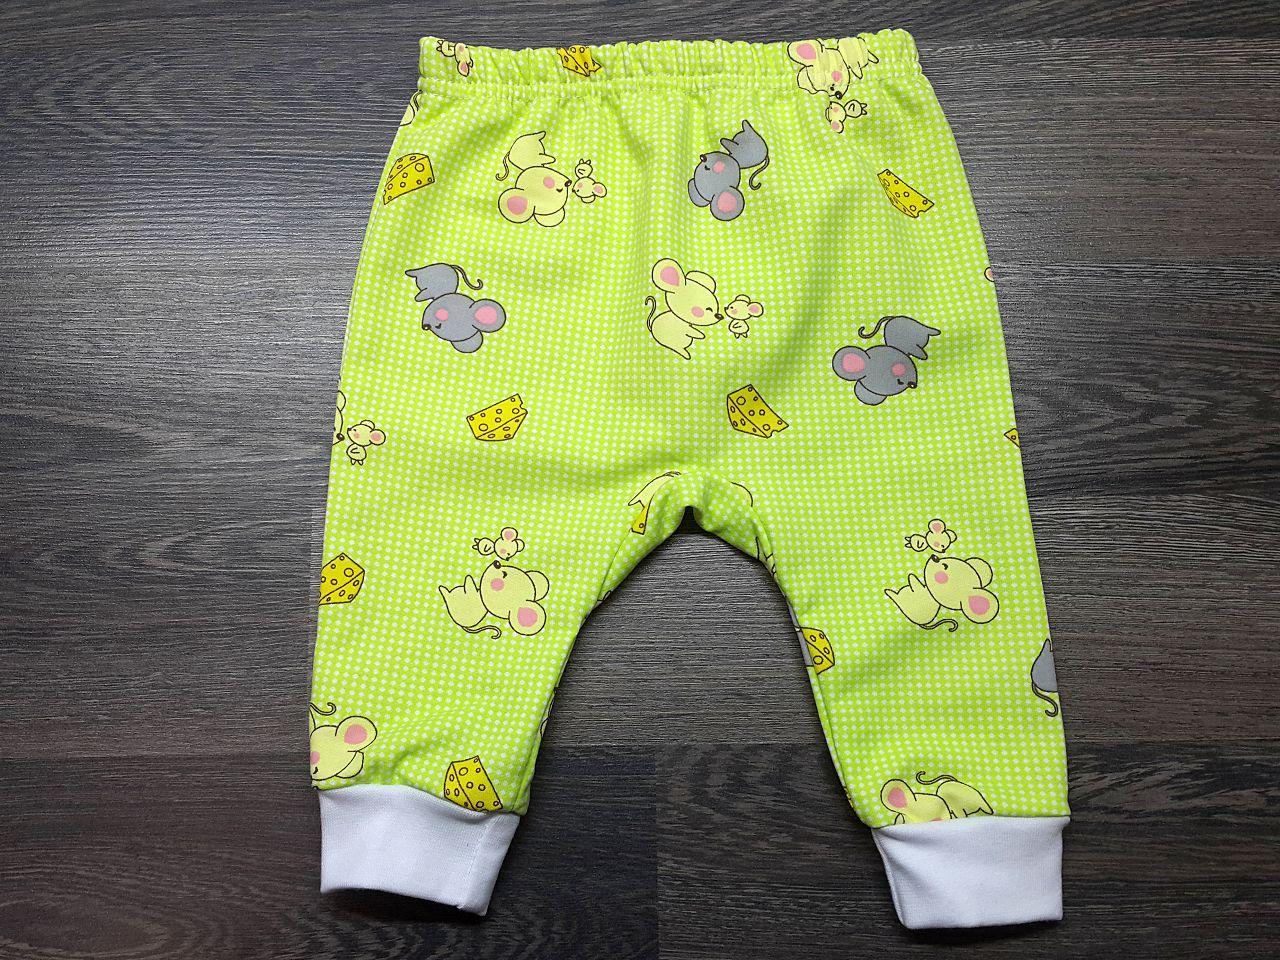 Штаны для малышей тёплые зелёные с мышками